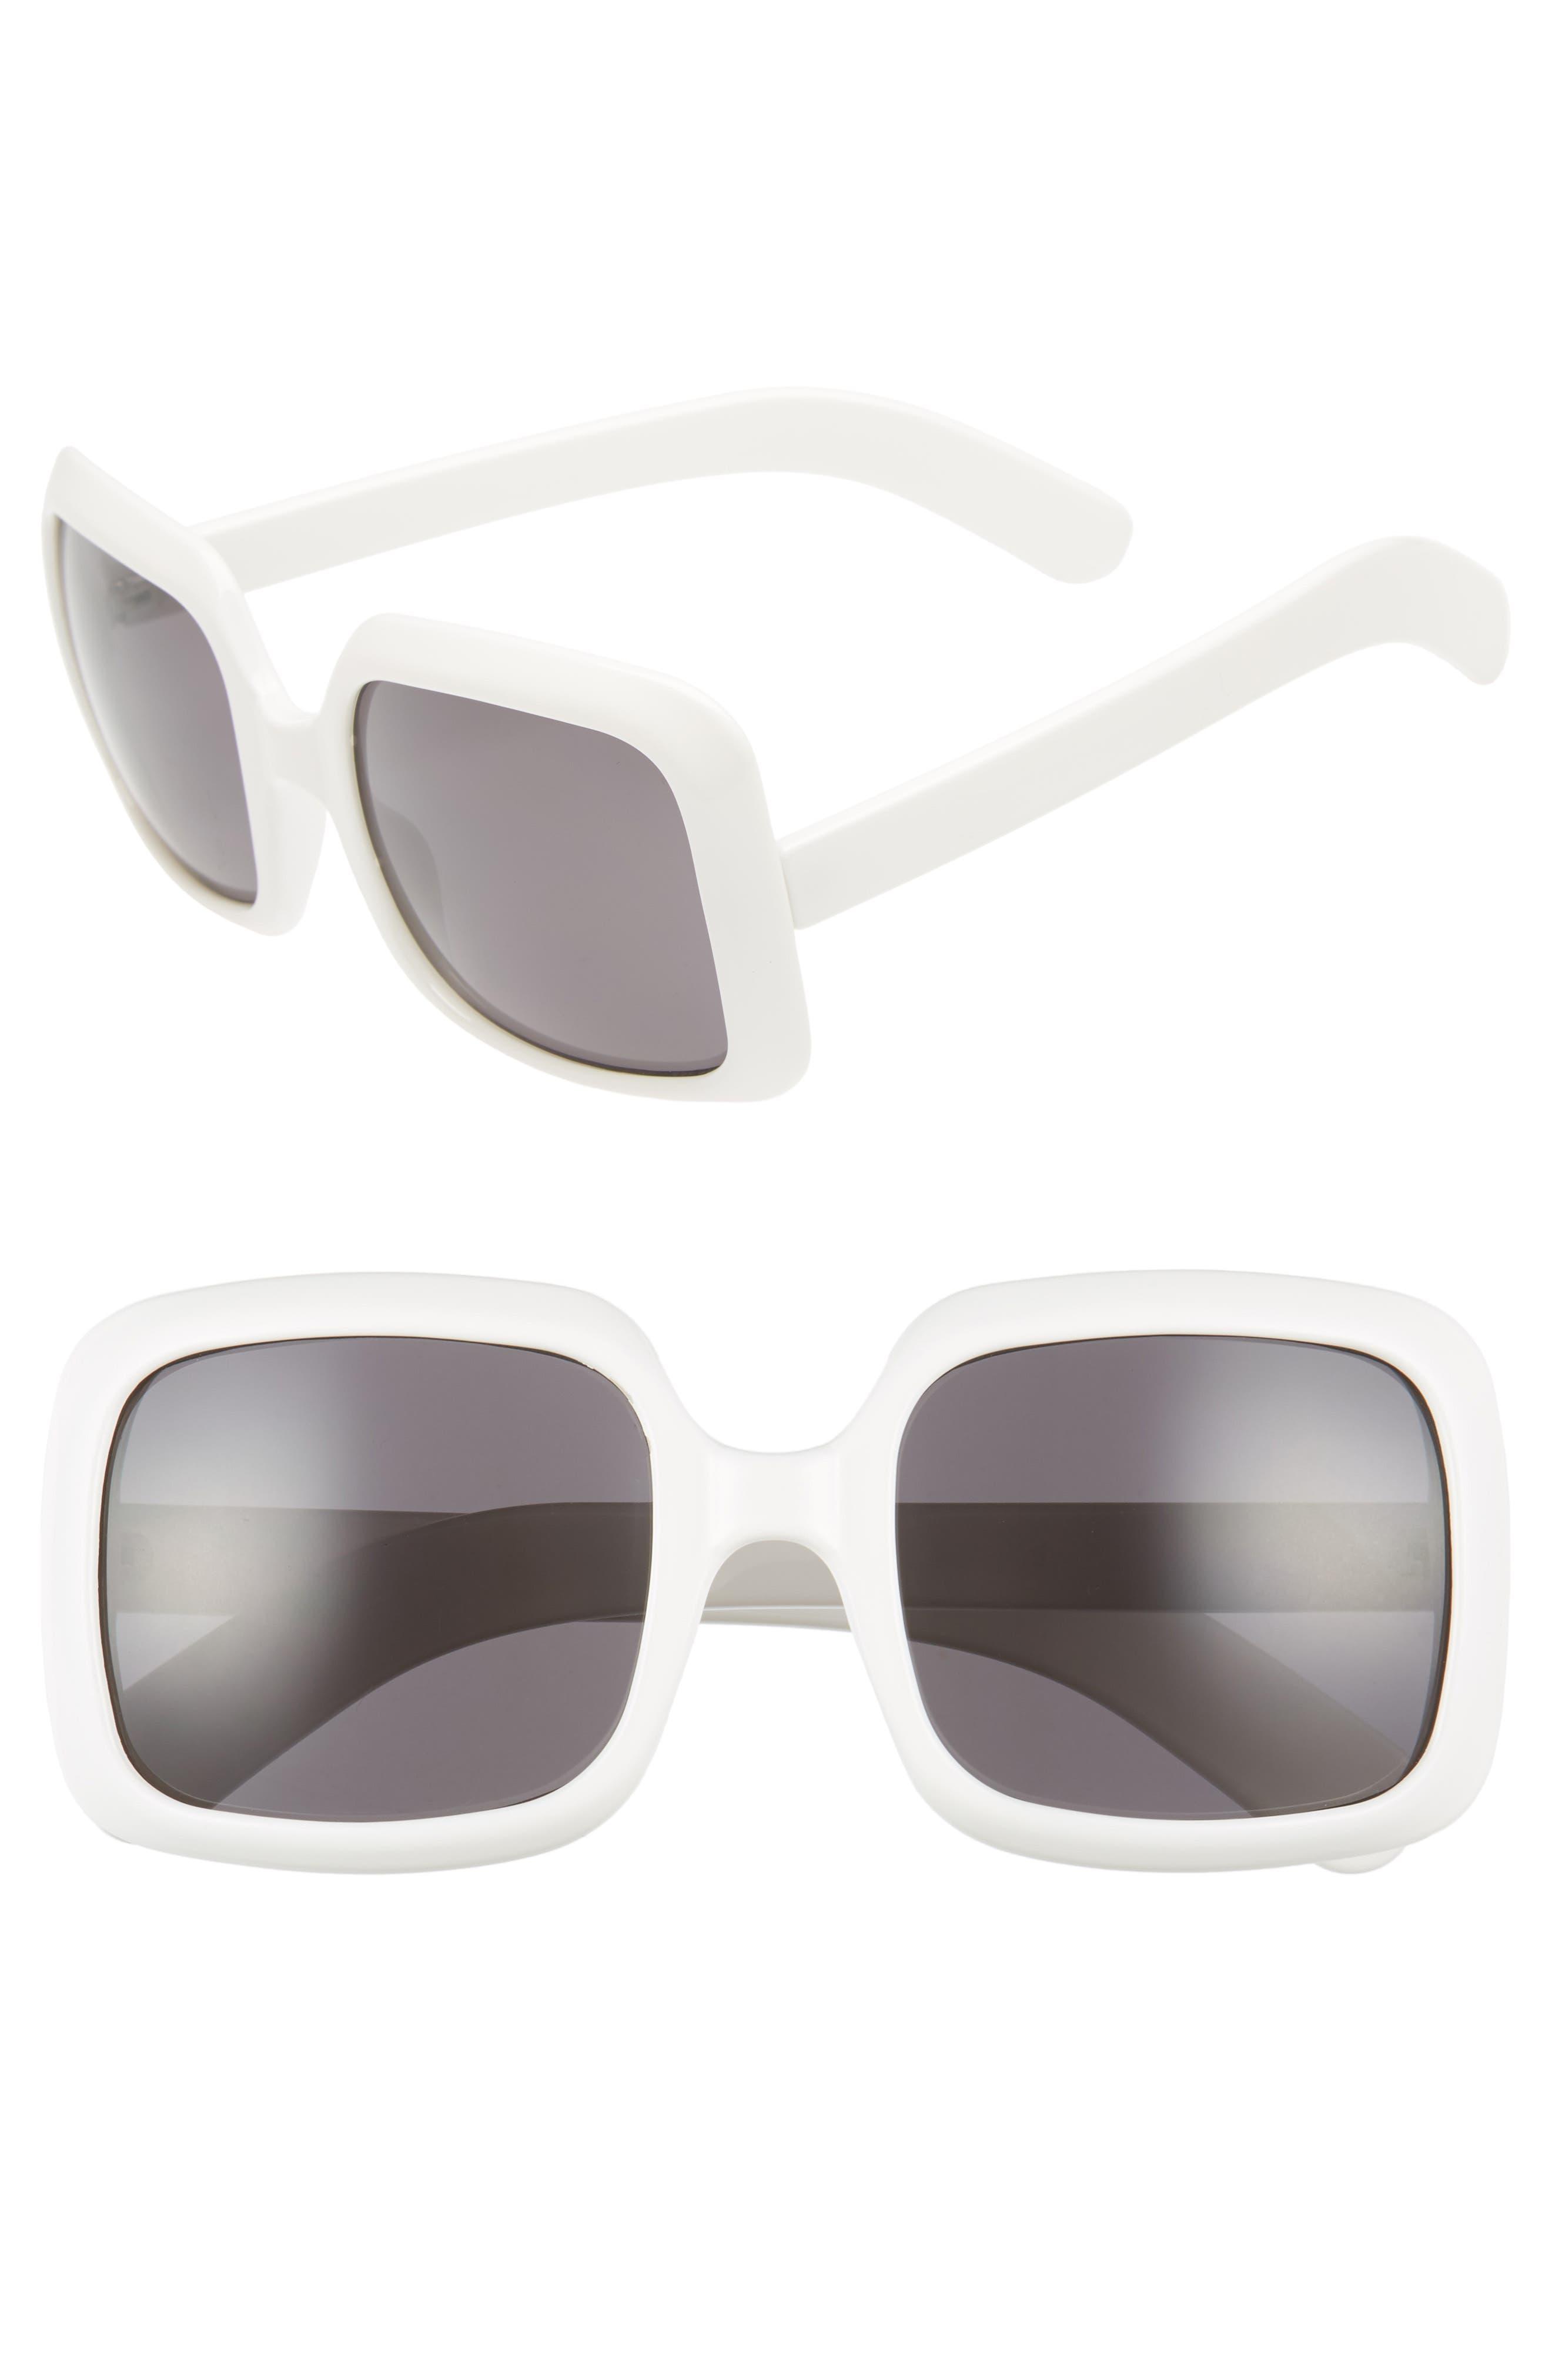 54mm Retro Square Sunglasses,                             Main thumbnail 1, color,                             100